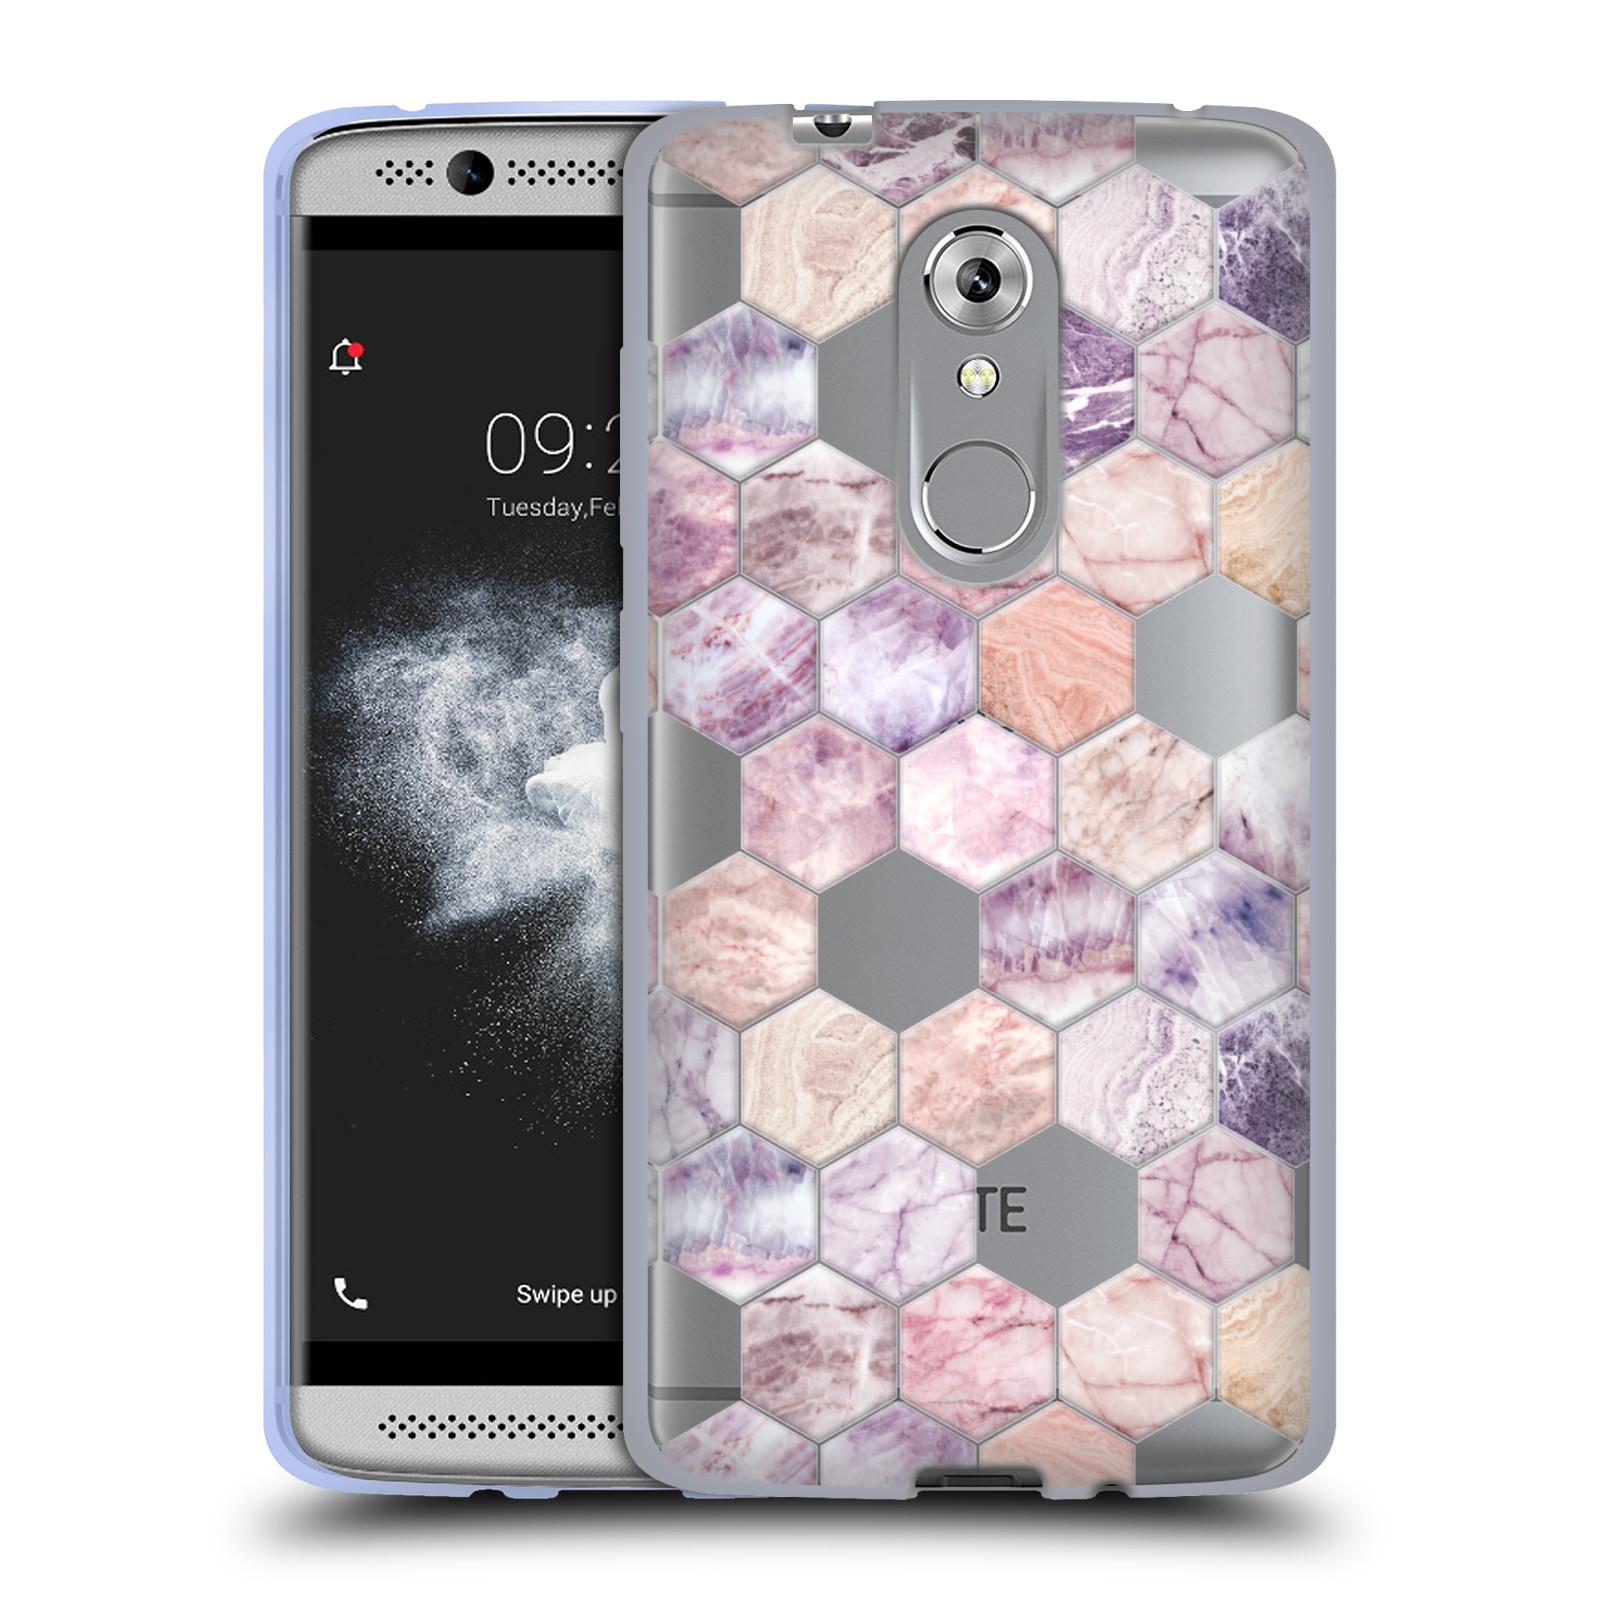 OFFICIAL-MICKLYN-LE-FEUVRE-PATTERNS-7-SOFT-GEL-CASE-FOR-ZTE-PHONES